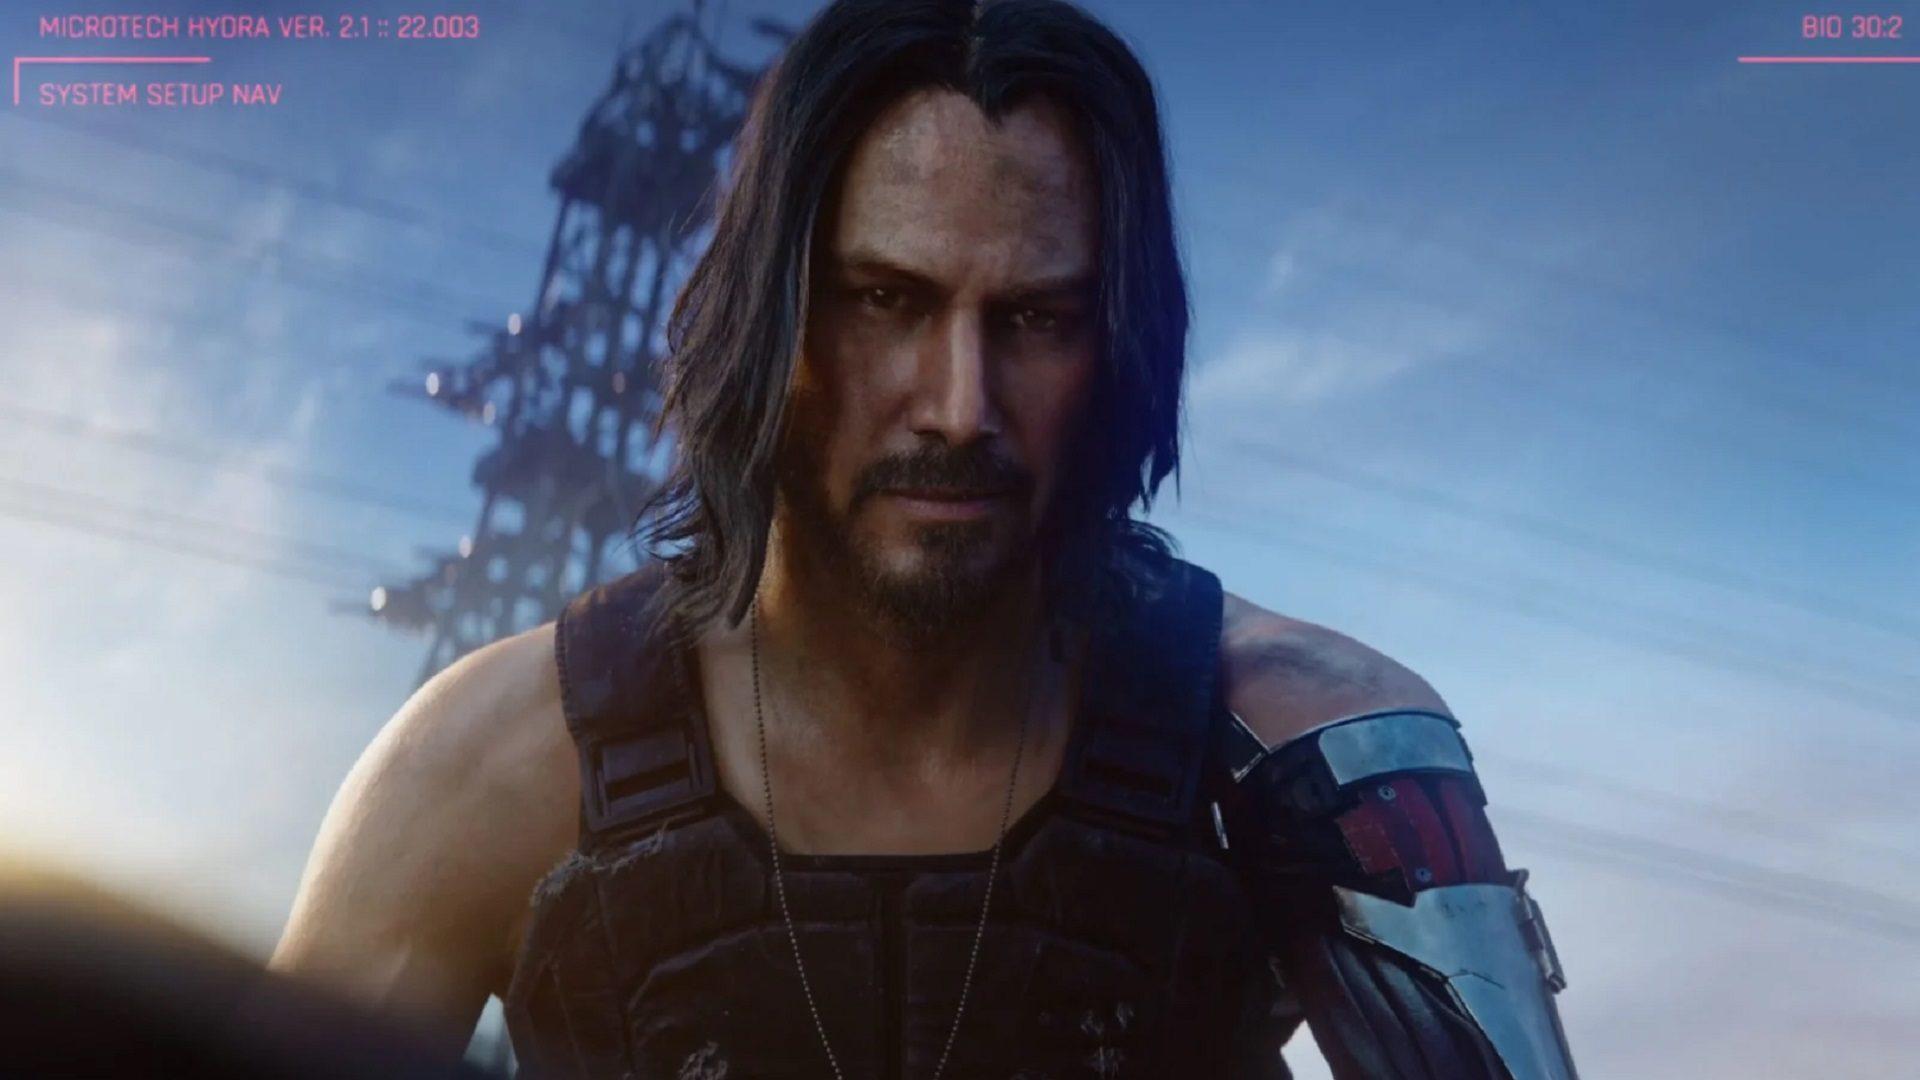 Cyberpunk 2077: Ο Keanu Reeves γίνεται χαρακτήρας videogame